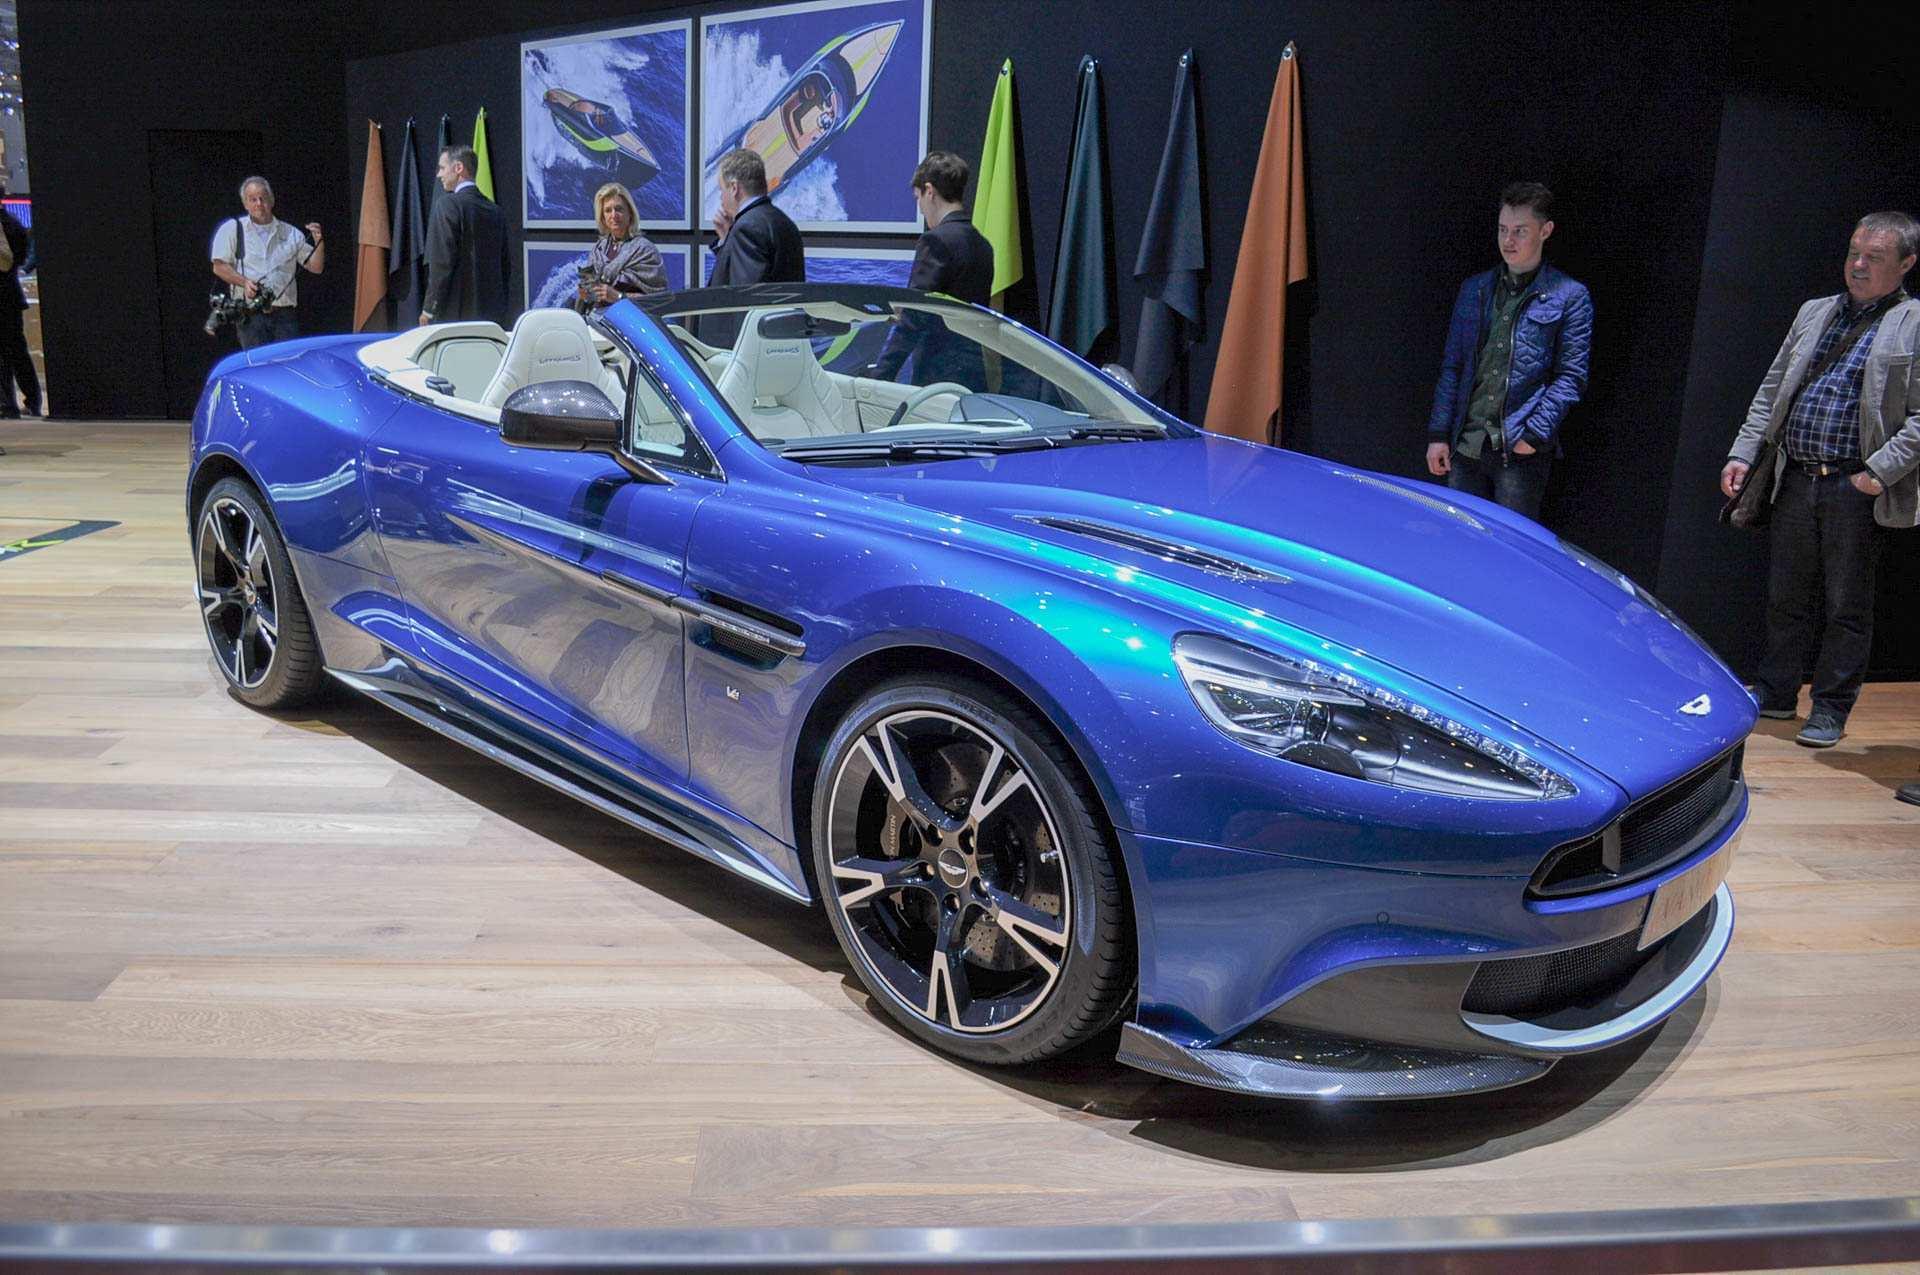 36 New 2019 Aston Martin Vanquish S Photos for 2019 Aston Martin Vanquish S